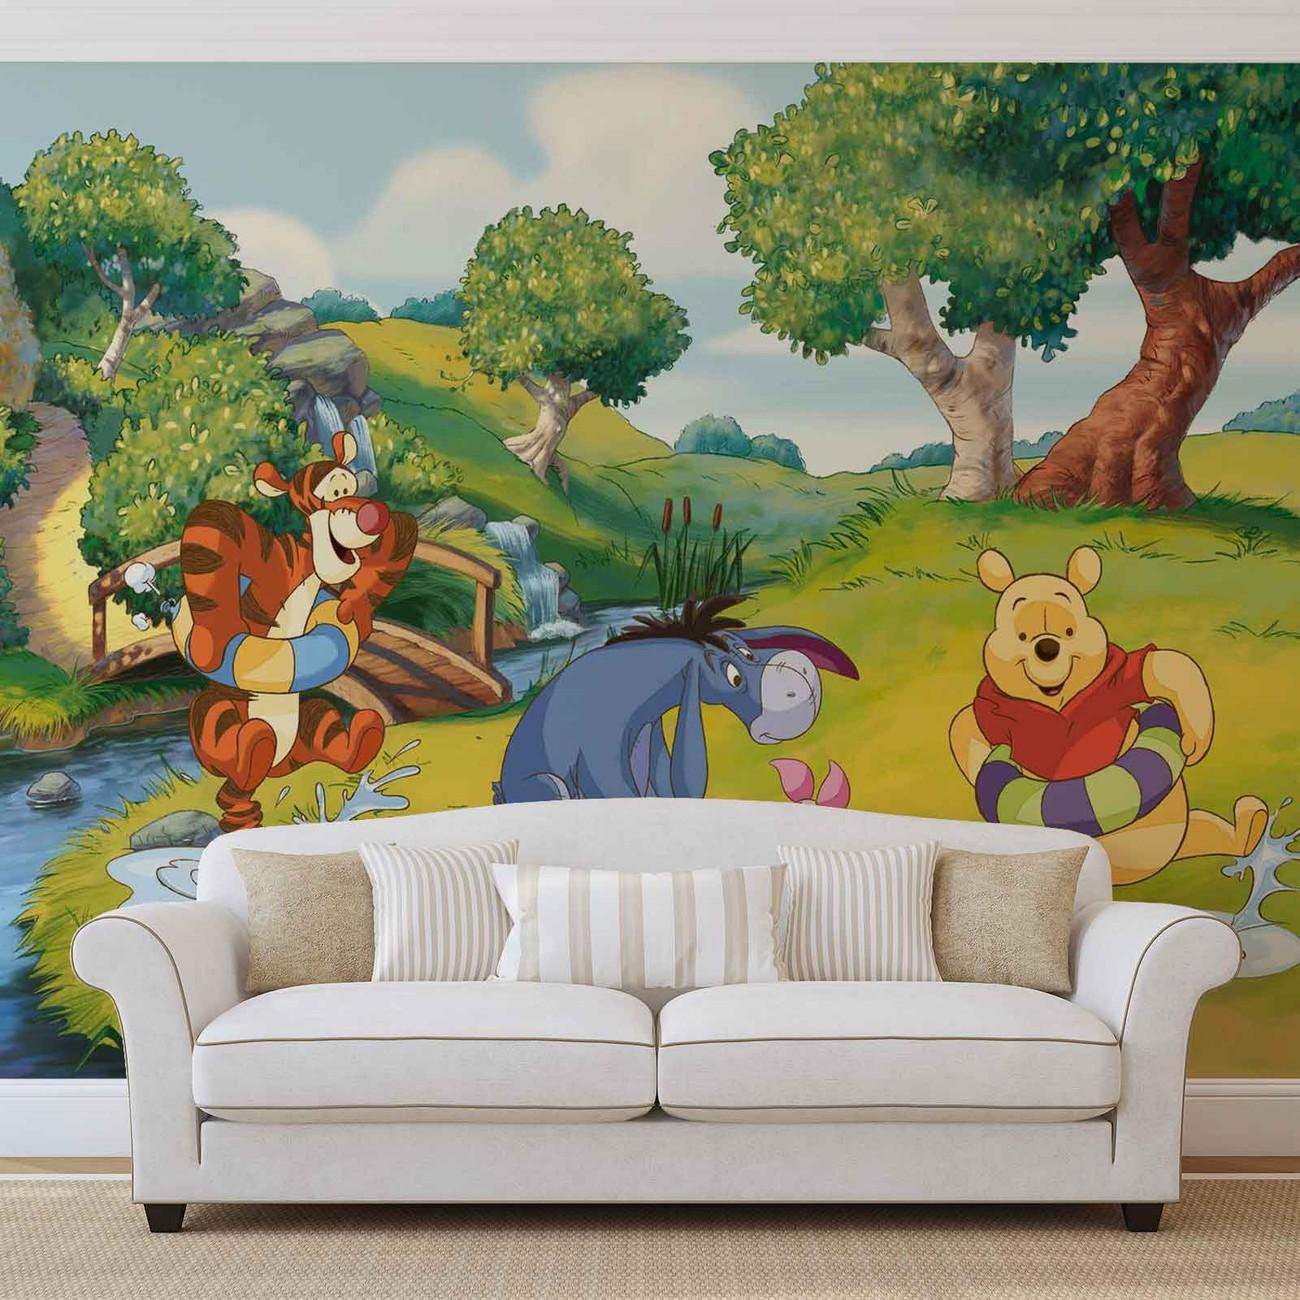 Disney winnie pooh tigger eeyore piglet wall paper mural for Disney wall mural uk